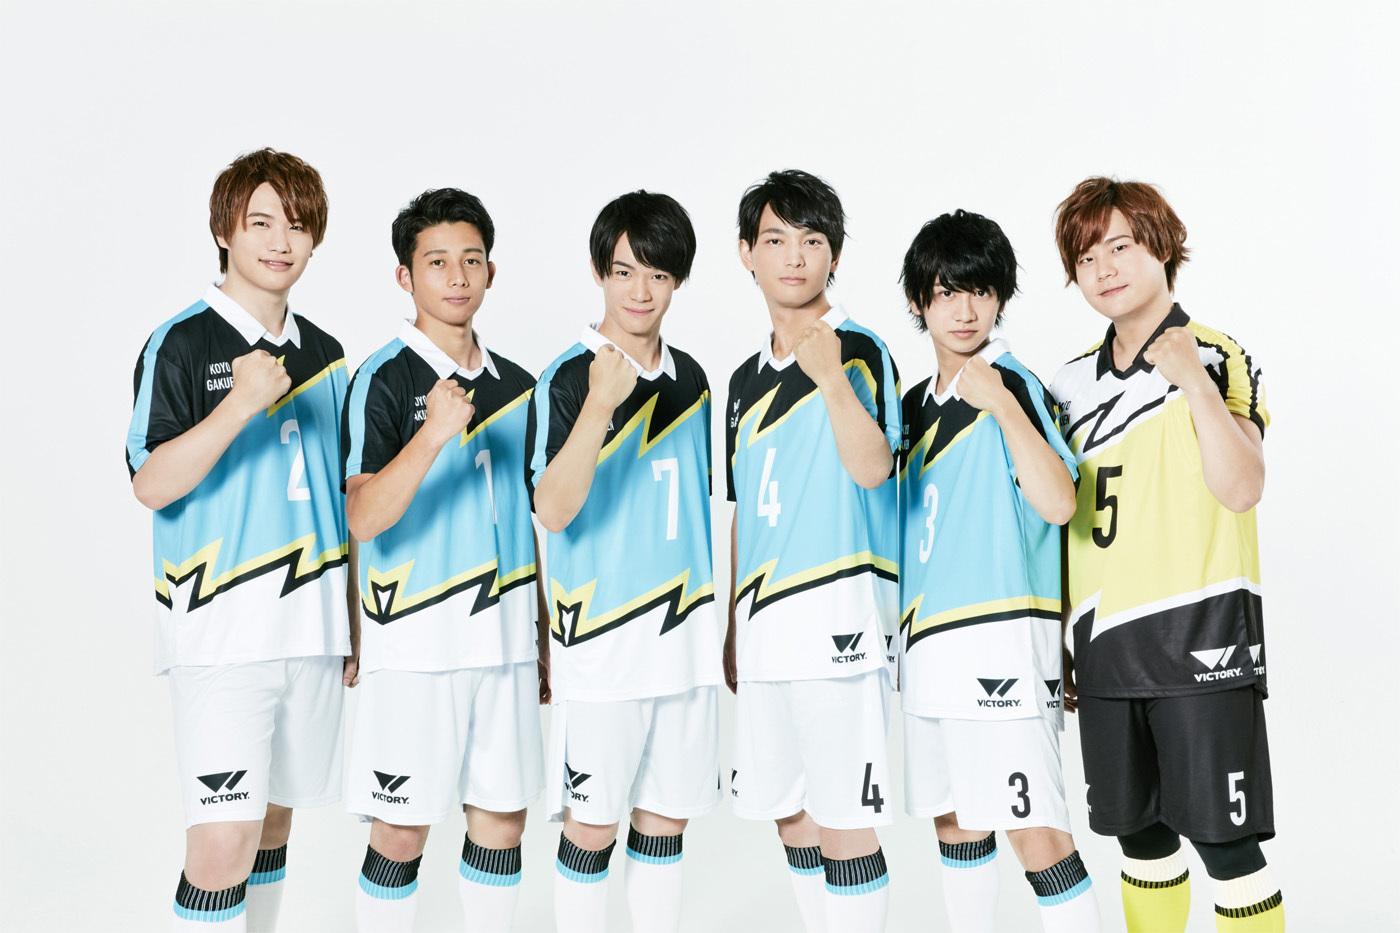 恒陽学園集合 (C)FUTSAL BOYS!!!!! ORIGINAL WORK